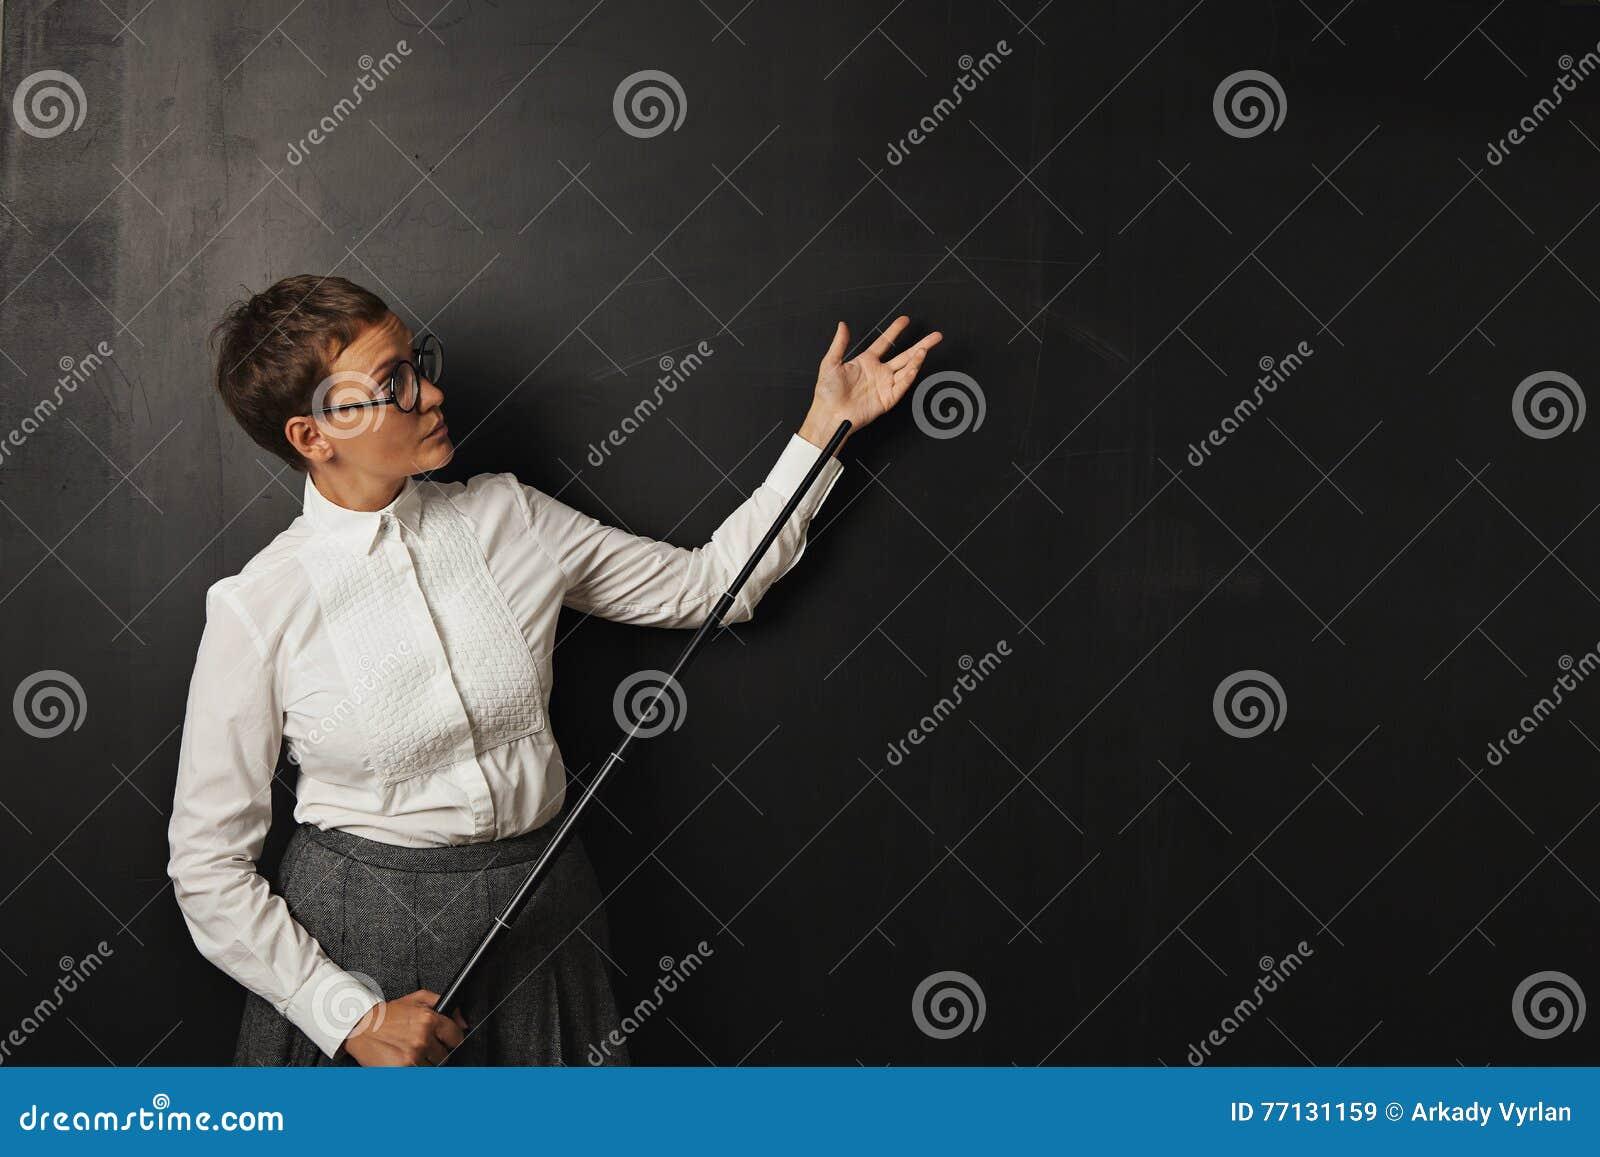 Female teacher with pointer at blackboard